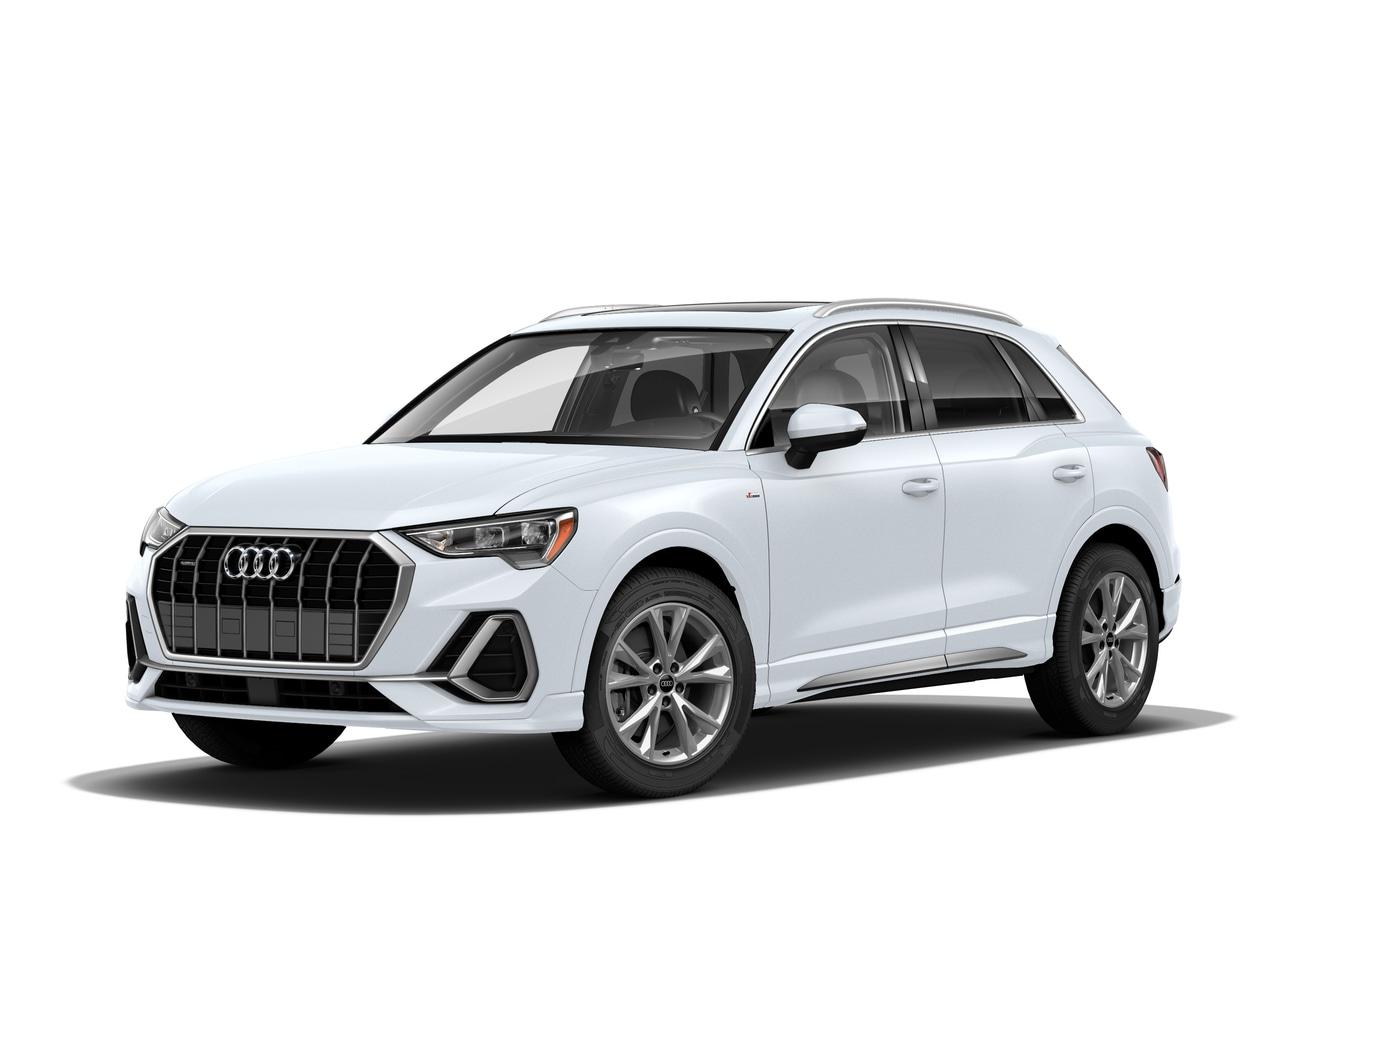 2021 Audi Q3 AWD 2.0T quattro Premium S line 45 TFSI SUV